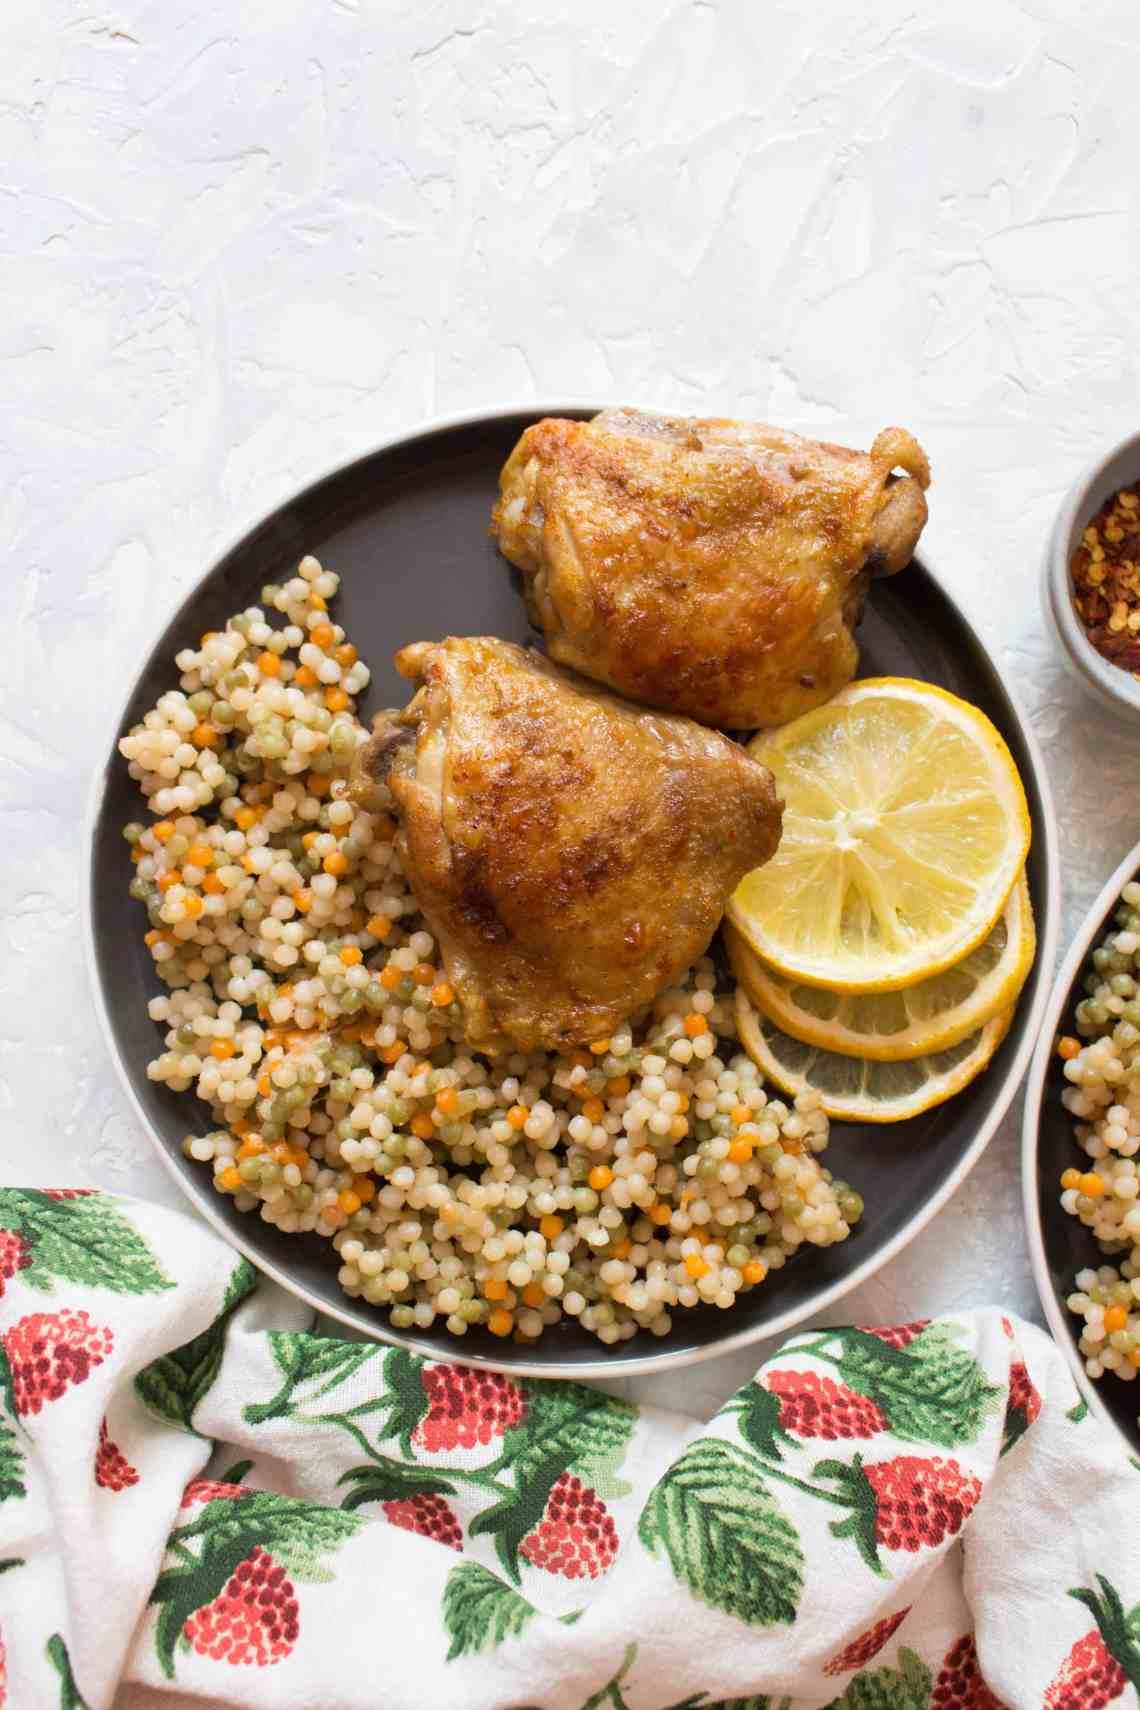 Instant Pot Lemon Garlic Chicken - Carmy - Run Eat Travel